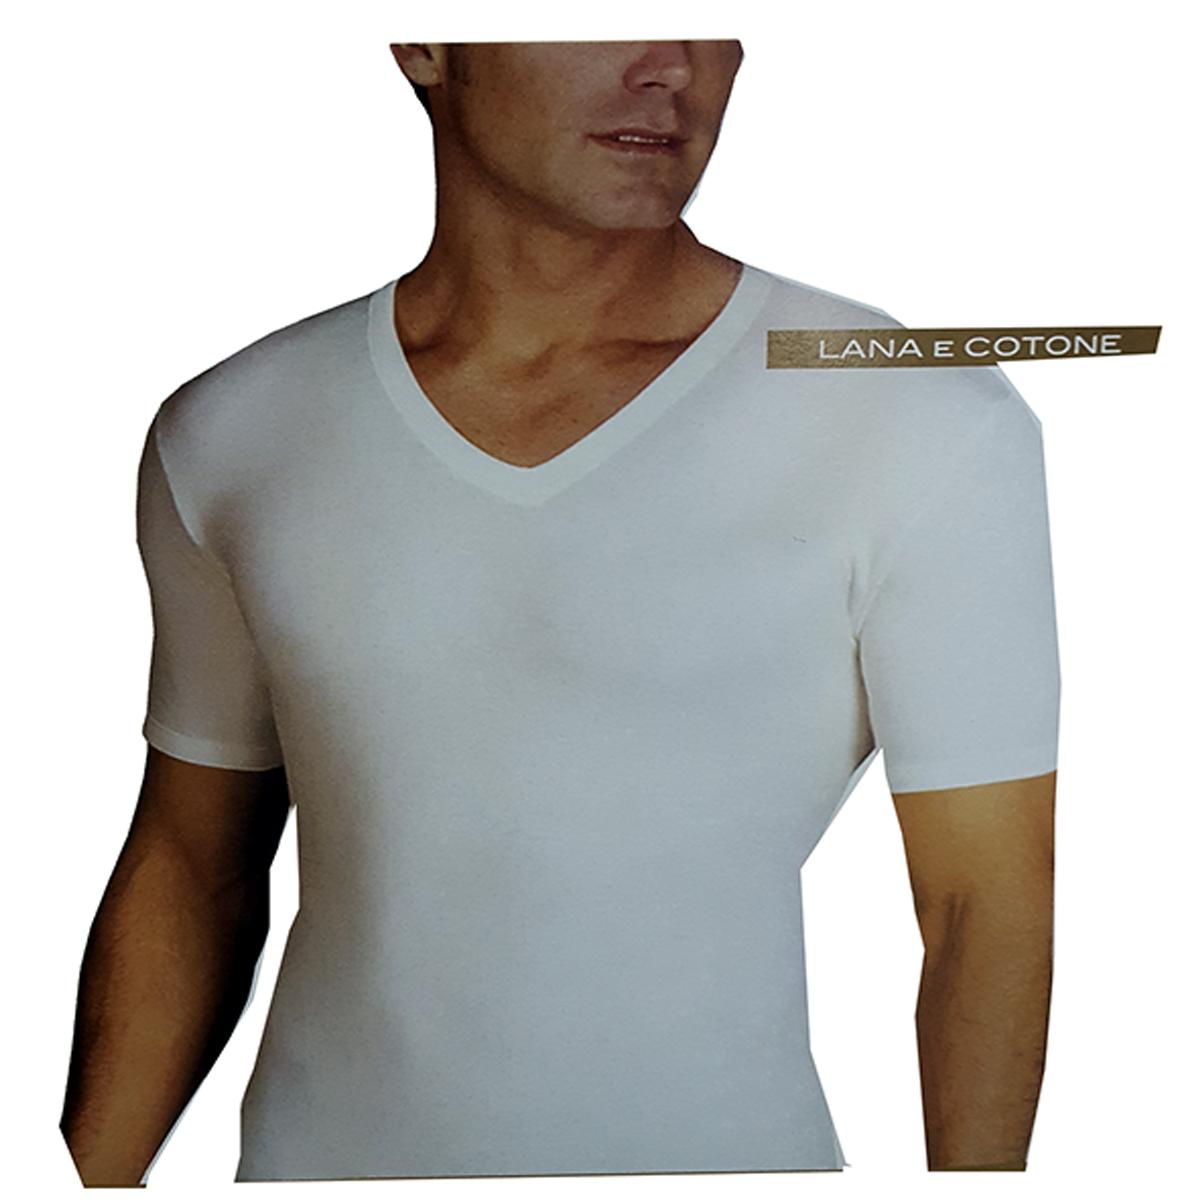 T-SHIRT Uomo Scollo a V Bianco 9 Pezzi SWEET YEARS 100/% COTONE